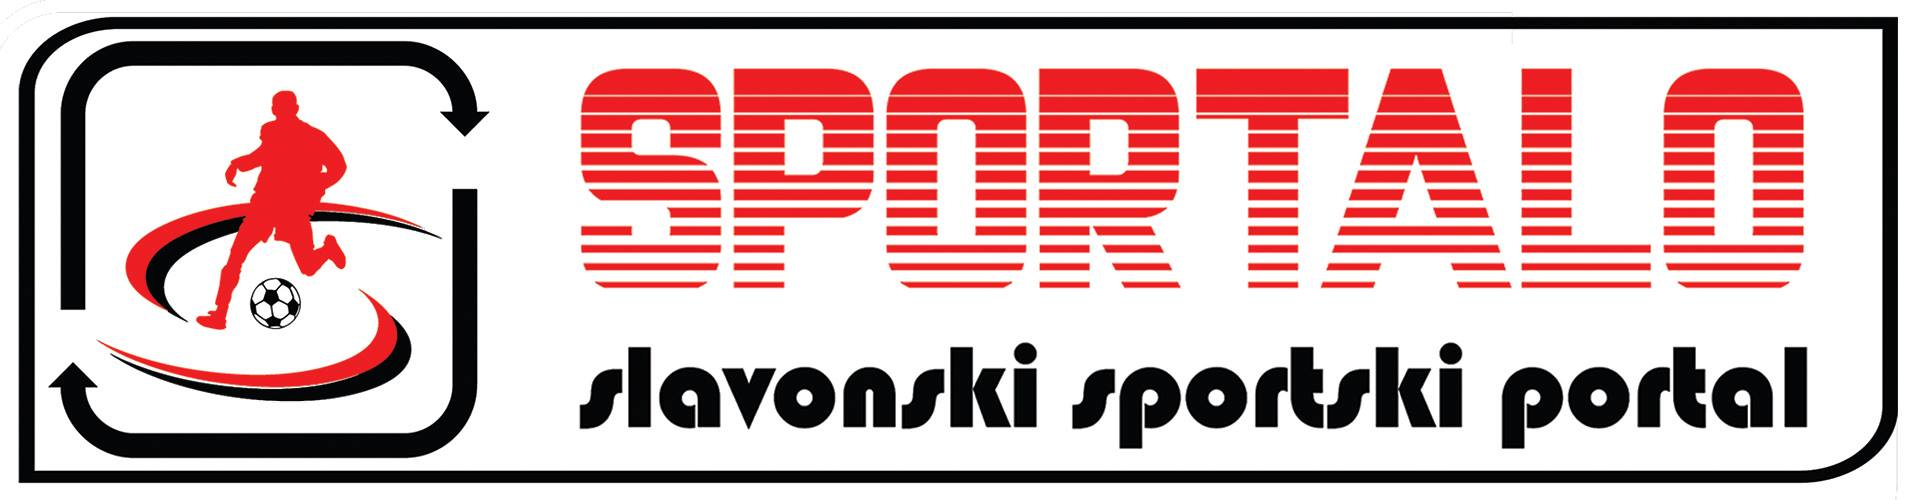 Slavonski sportski portal | SPORTALO